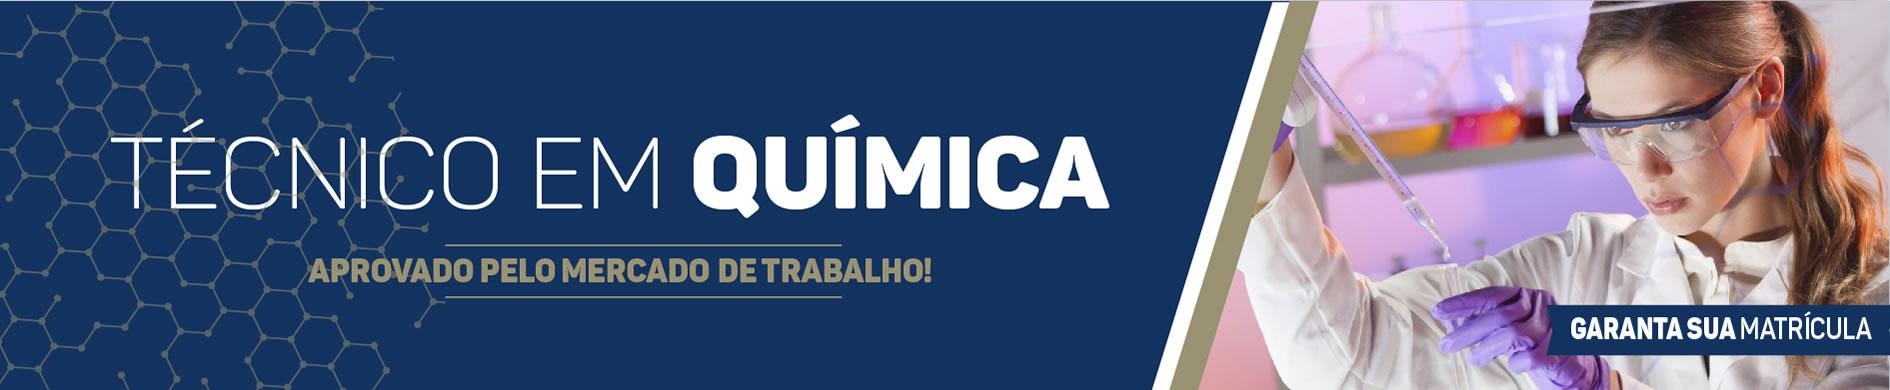 banner-anchieta-quimica-home-1890x390